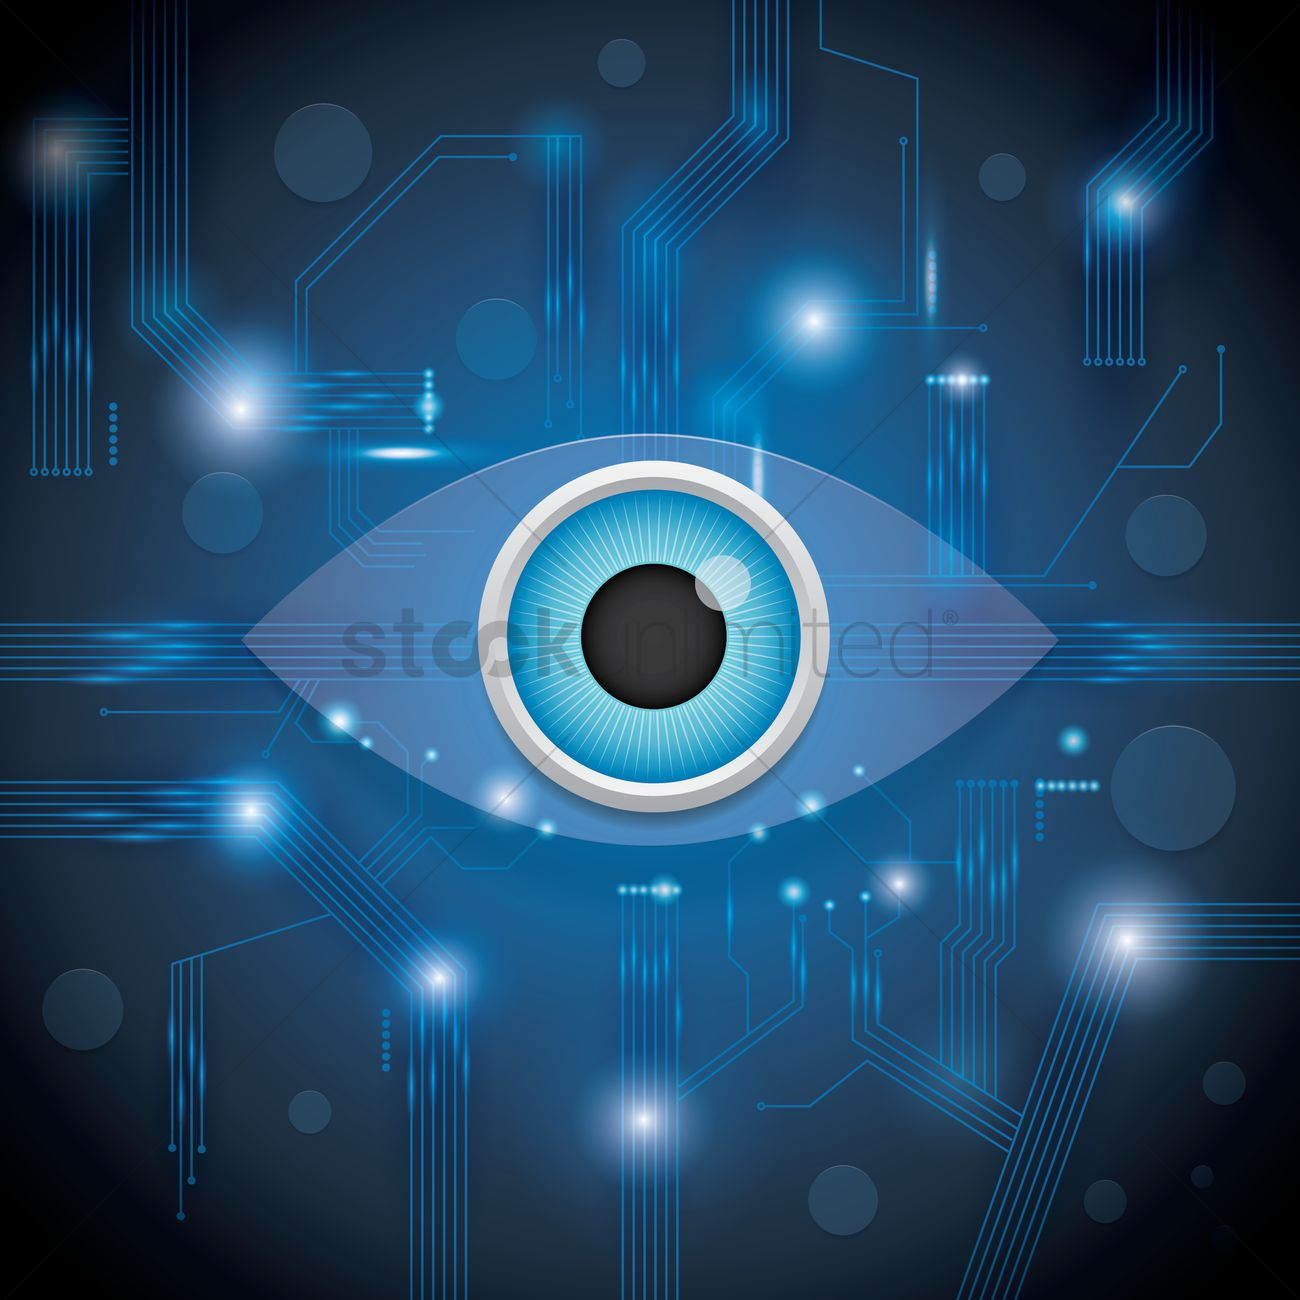 Eye design on circuit wallpaper. Vector Image - 1807646 | StockUnlimited